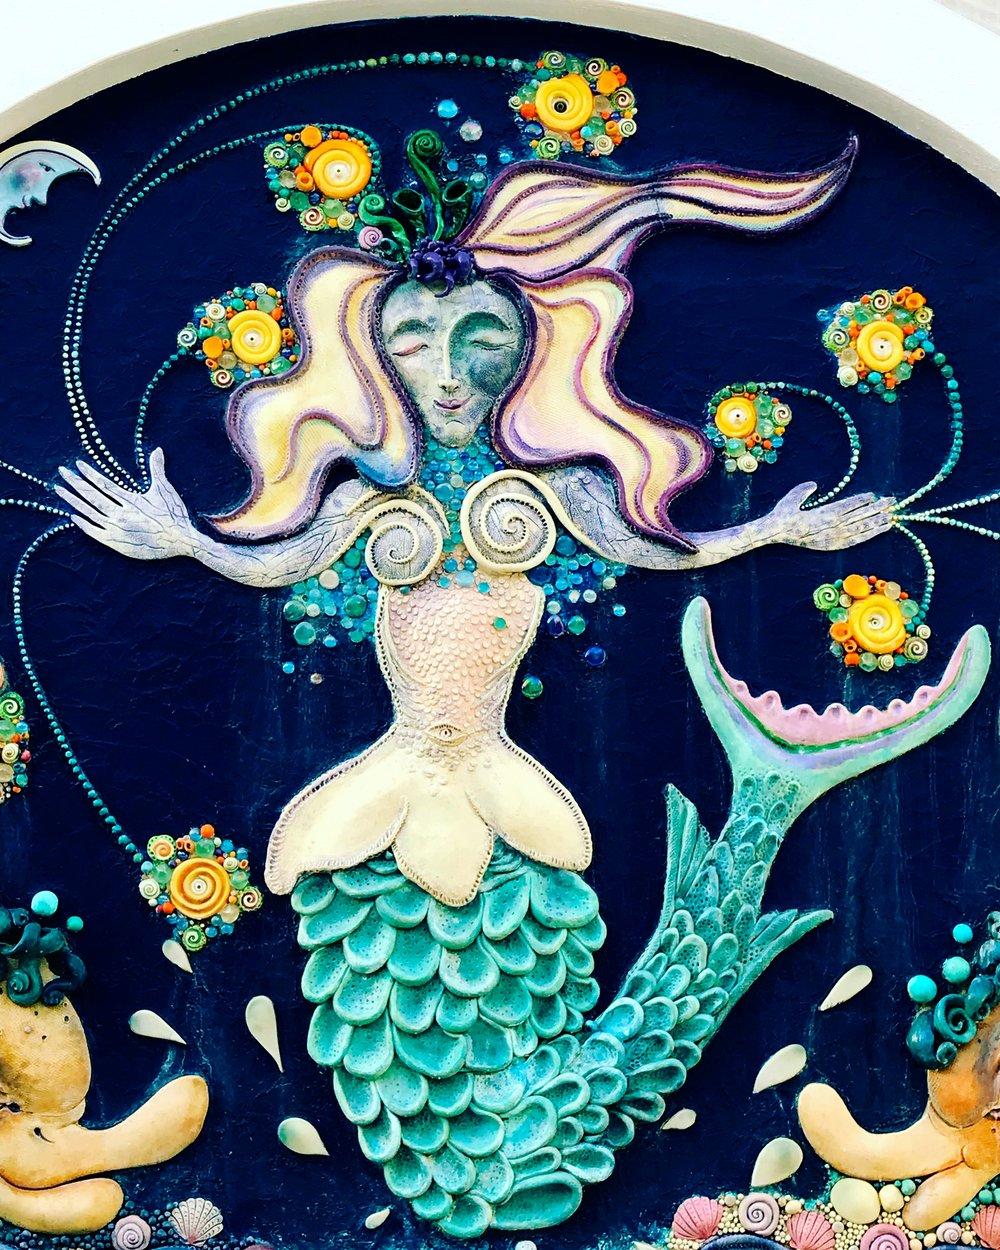 Nancy Goodheart Matthews created the Mermaid Fountain in Sarasota,